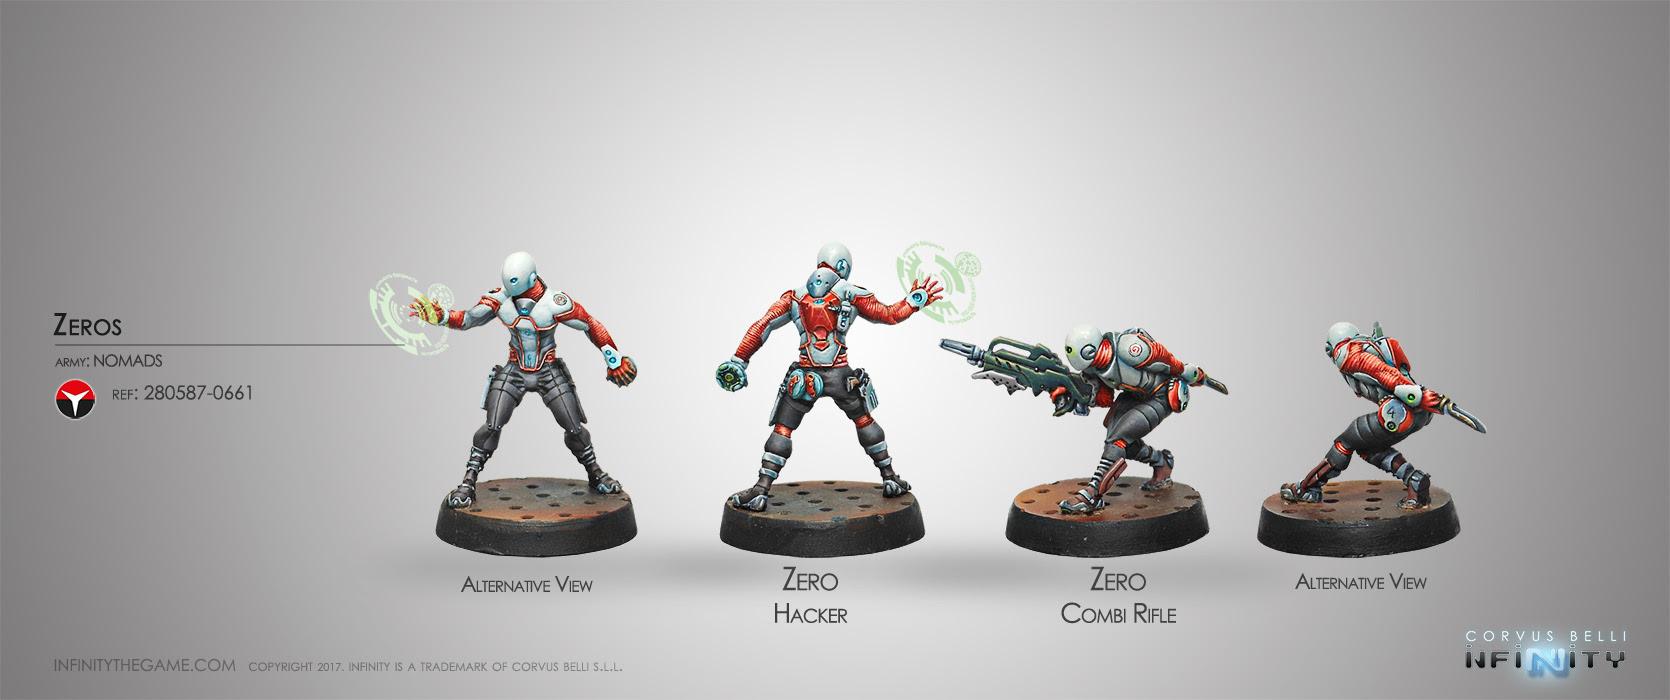 ZEROS (COMBI RIFLE / HACKER)